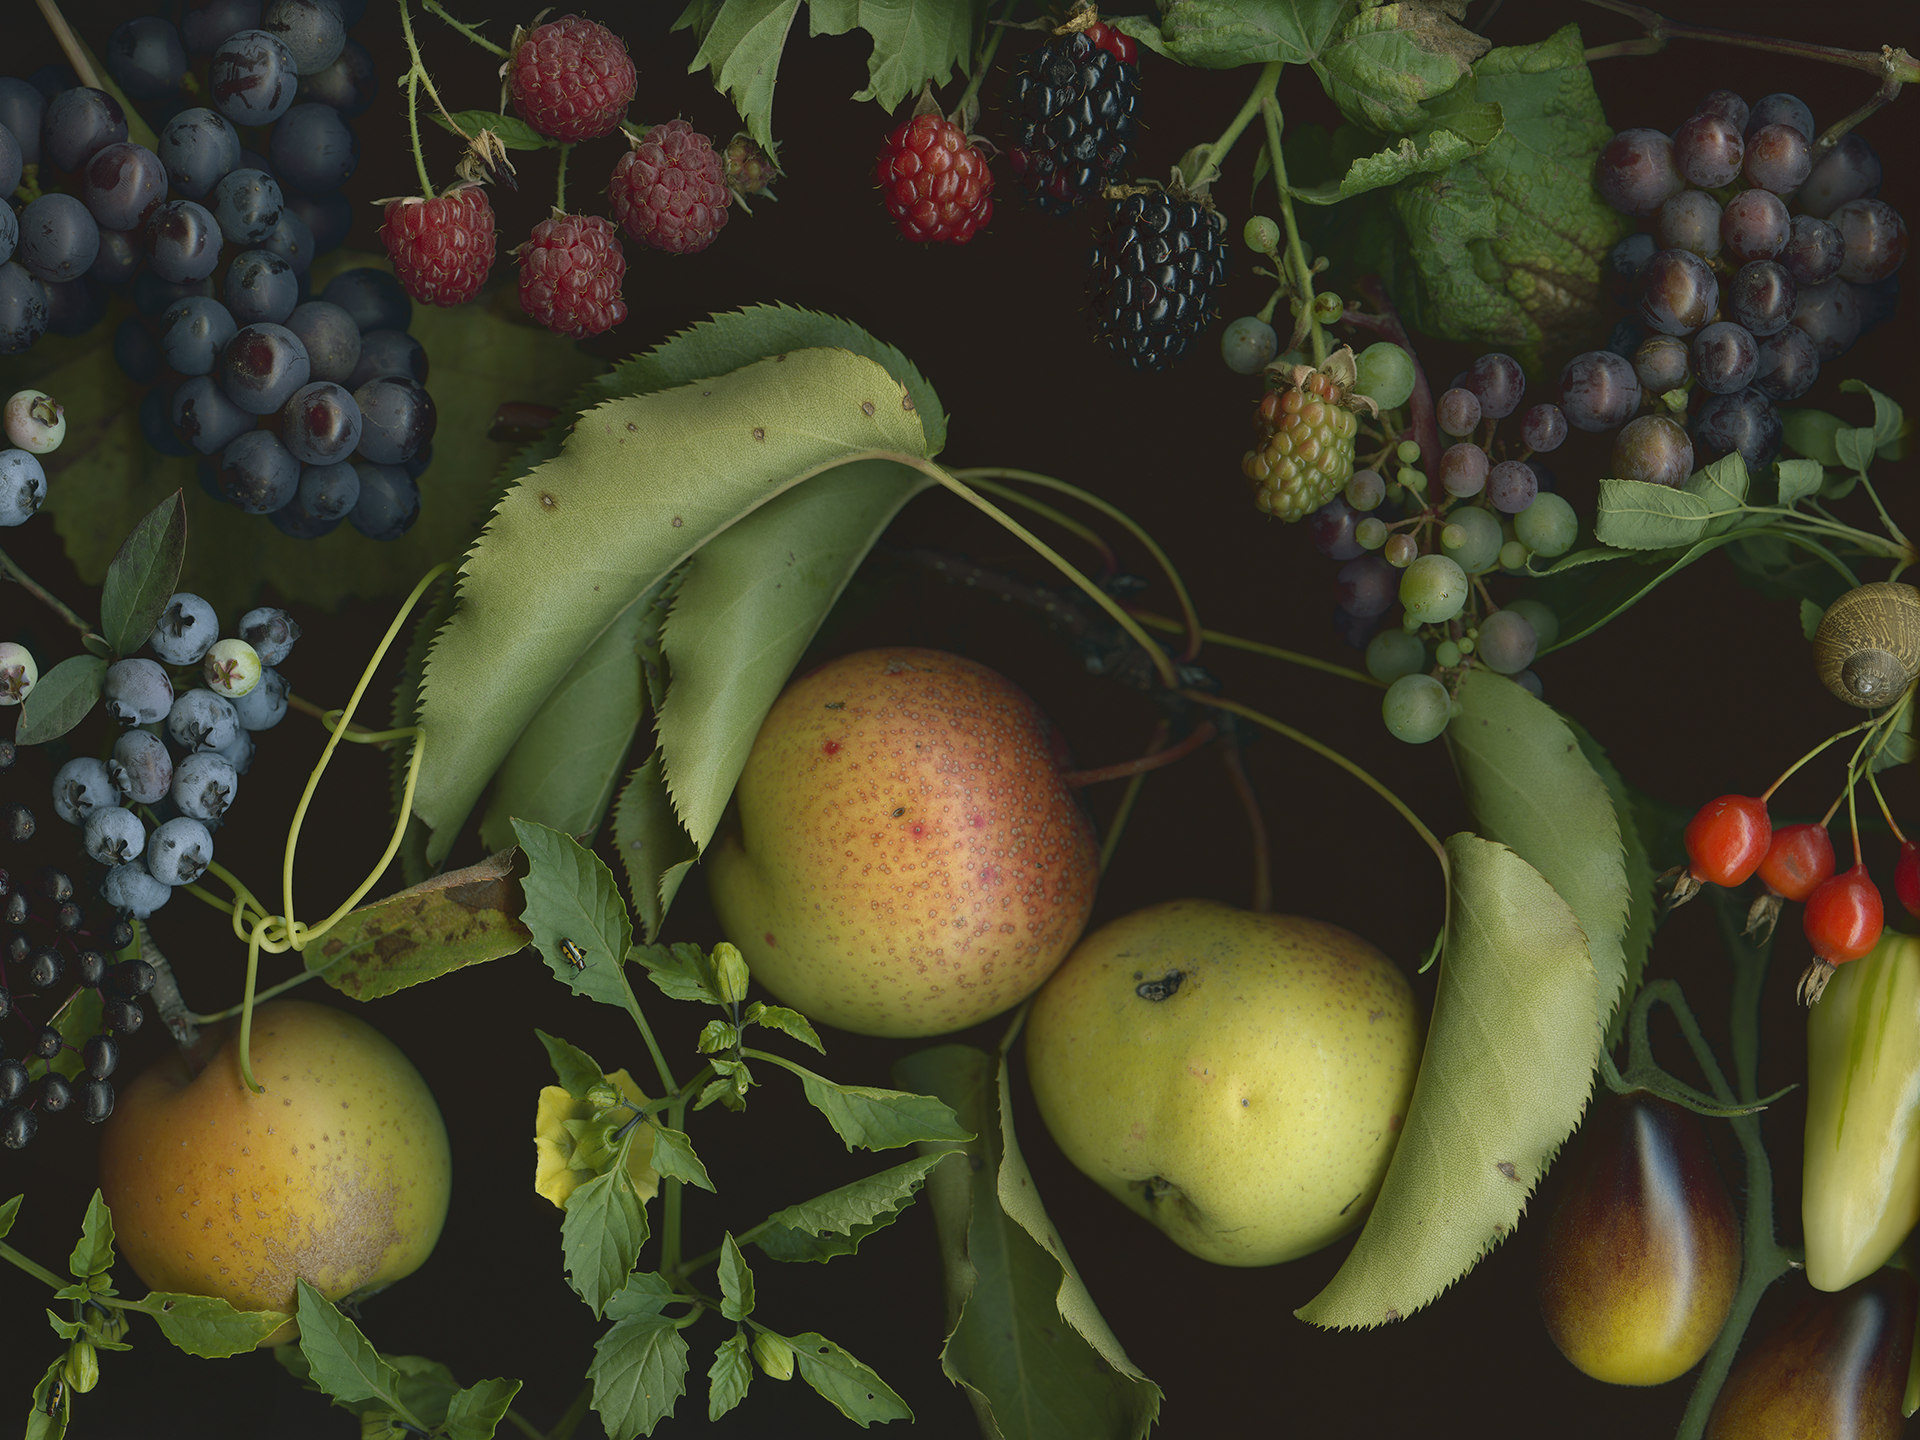 Blueberries, Blackberries, and Indigo Pear Drops